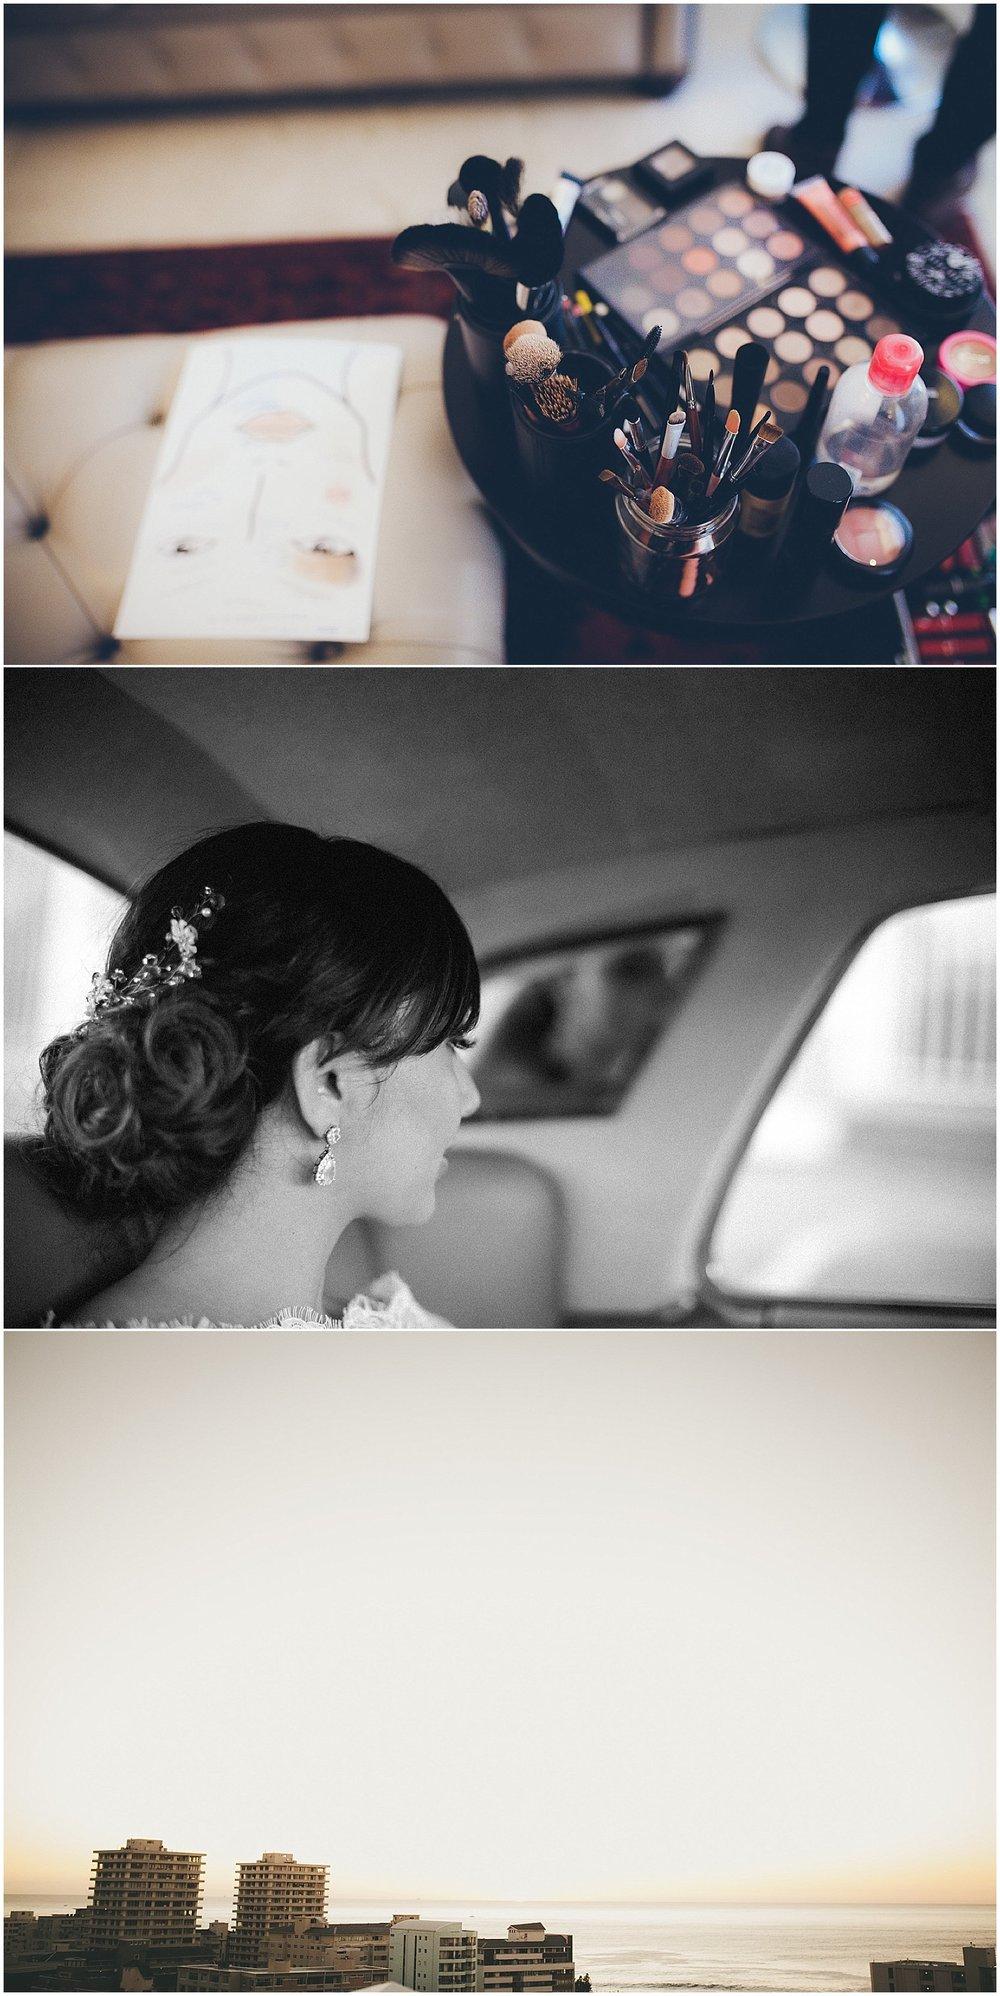 Shavinia&Rian_CapeTown_FionaClairPhotography-9.jpg